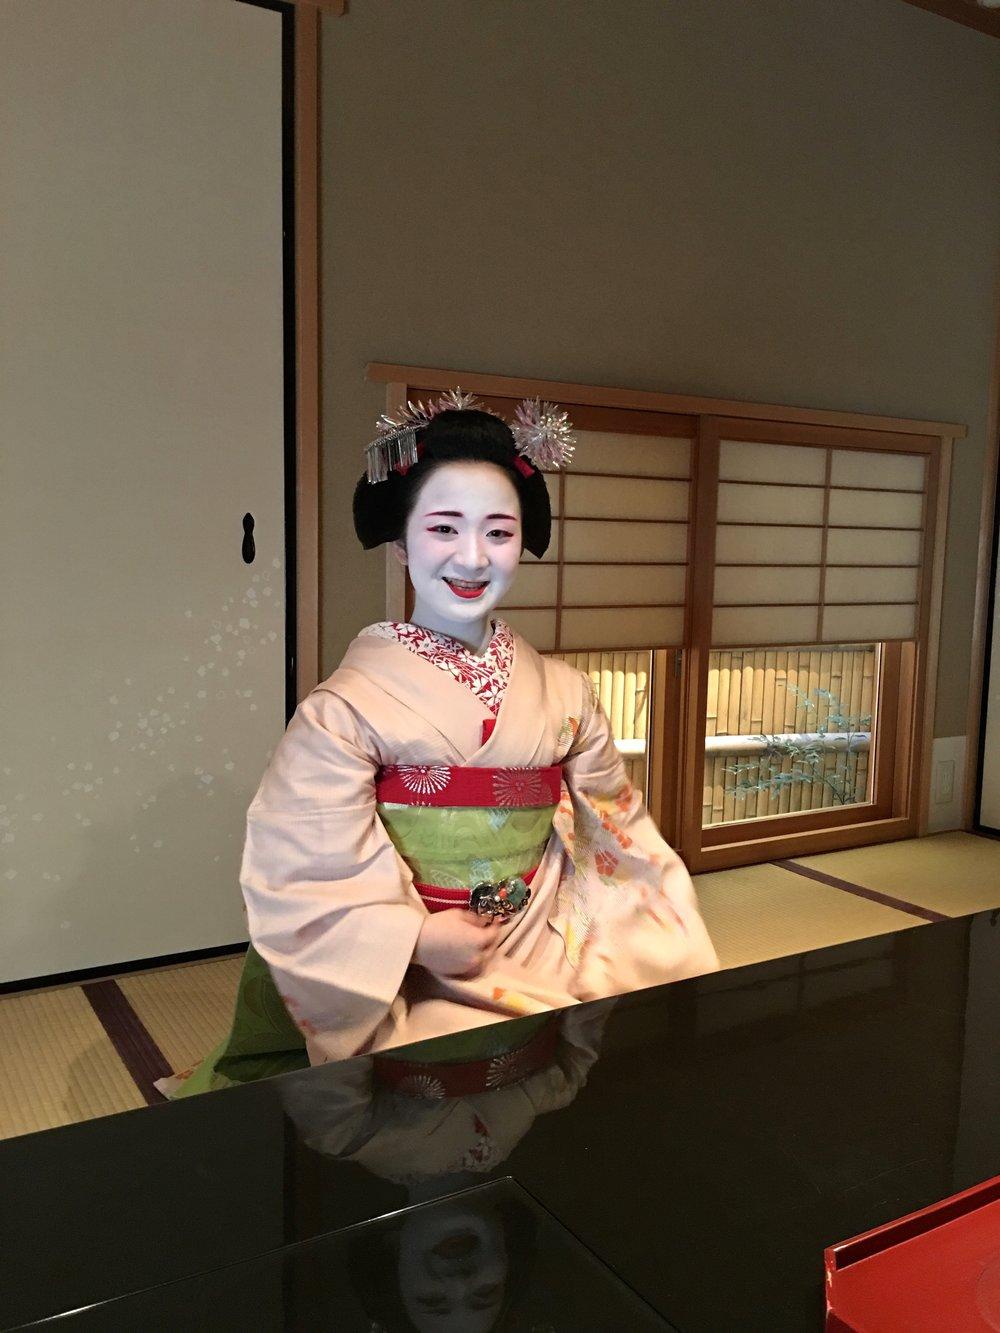 teri_Japan_Kyoto_Maiko_dinner_spiritedtable_photo5.jpg